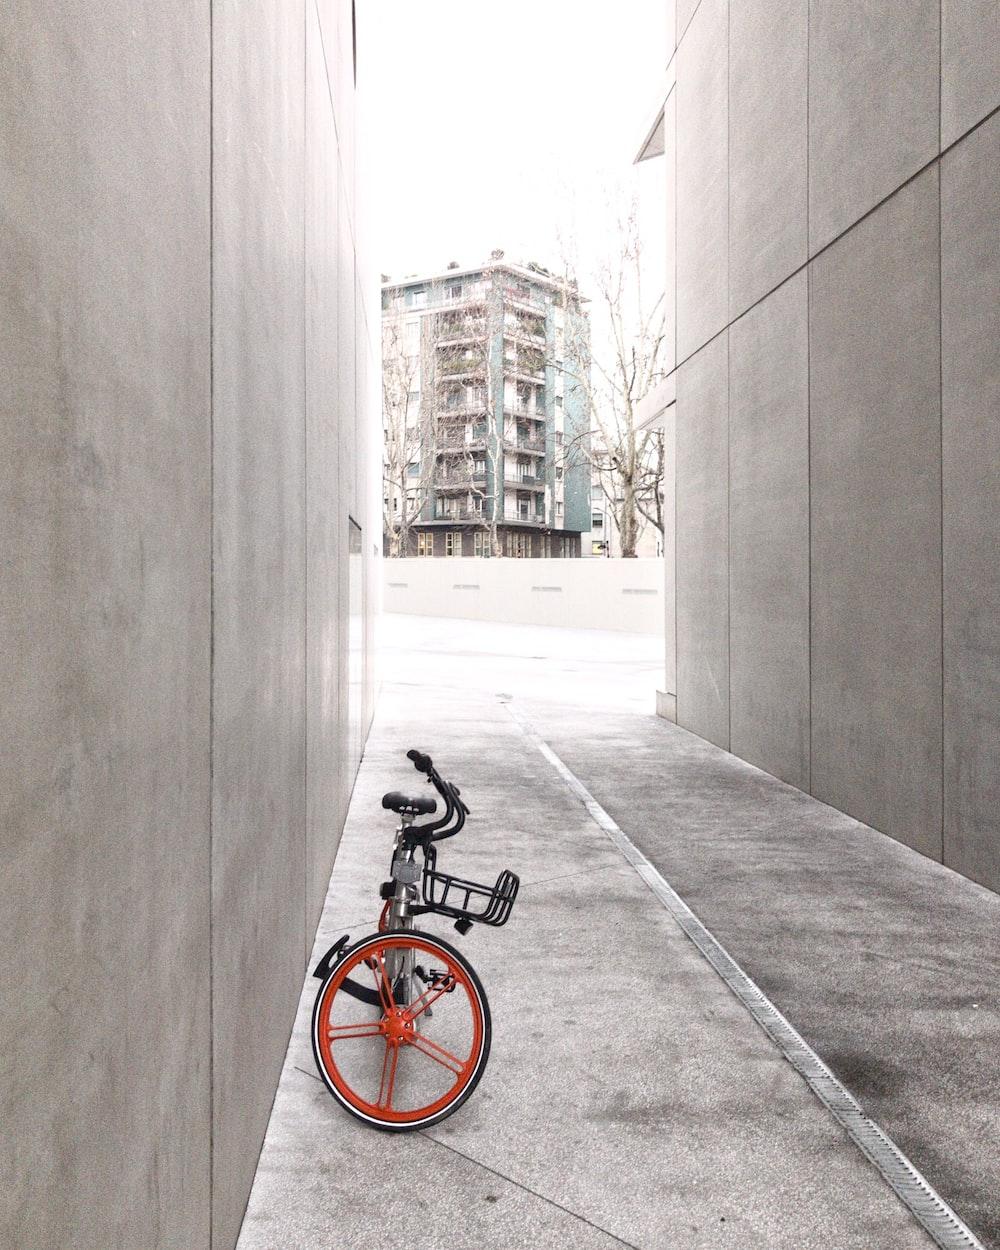 black and orange bicycle in between concrete walls